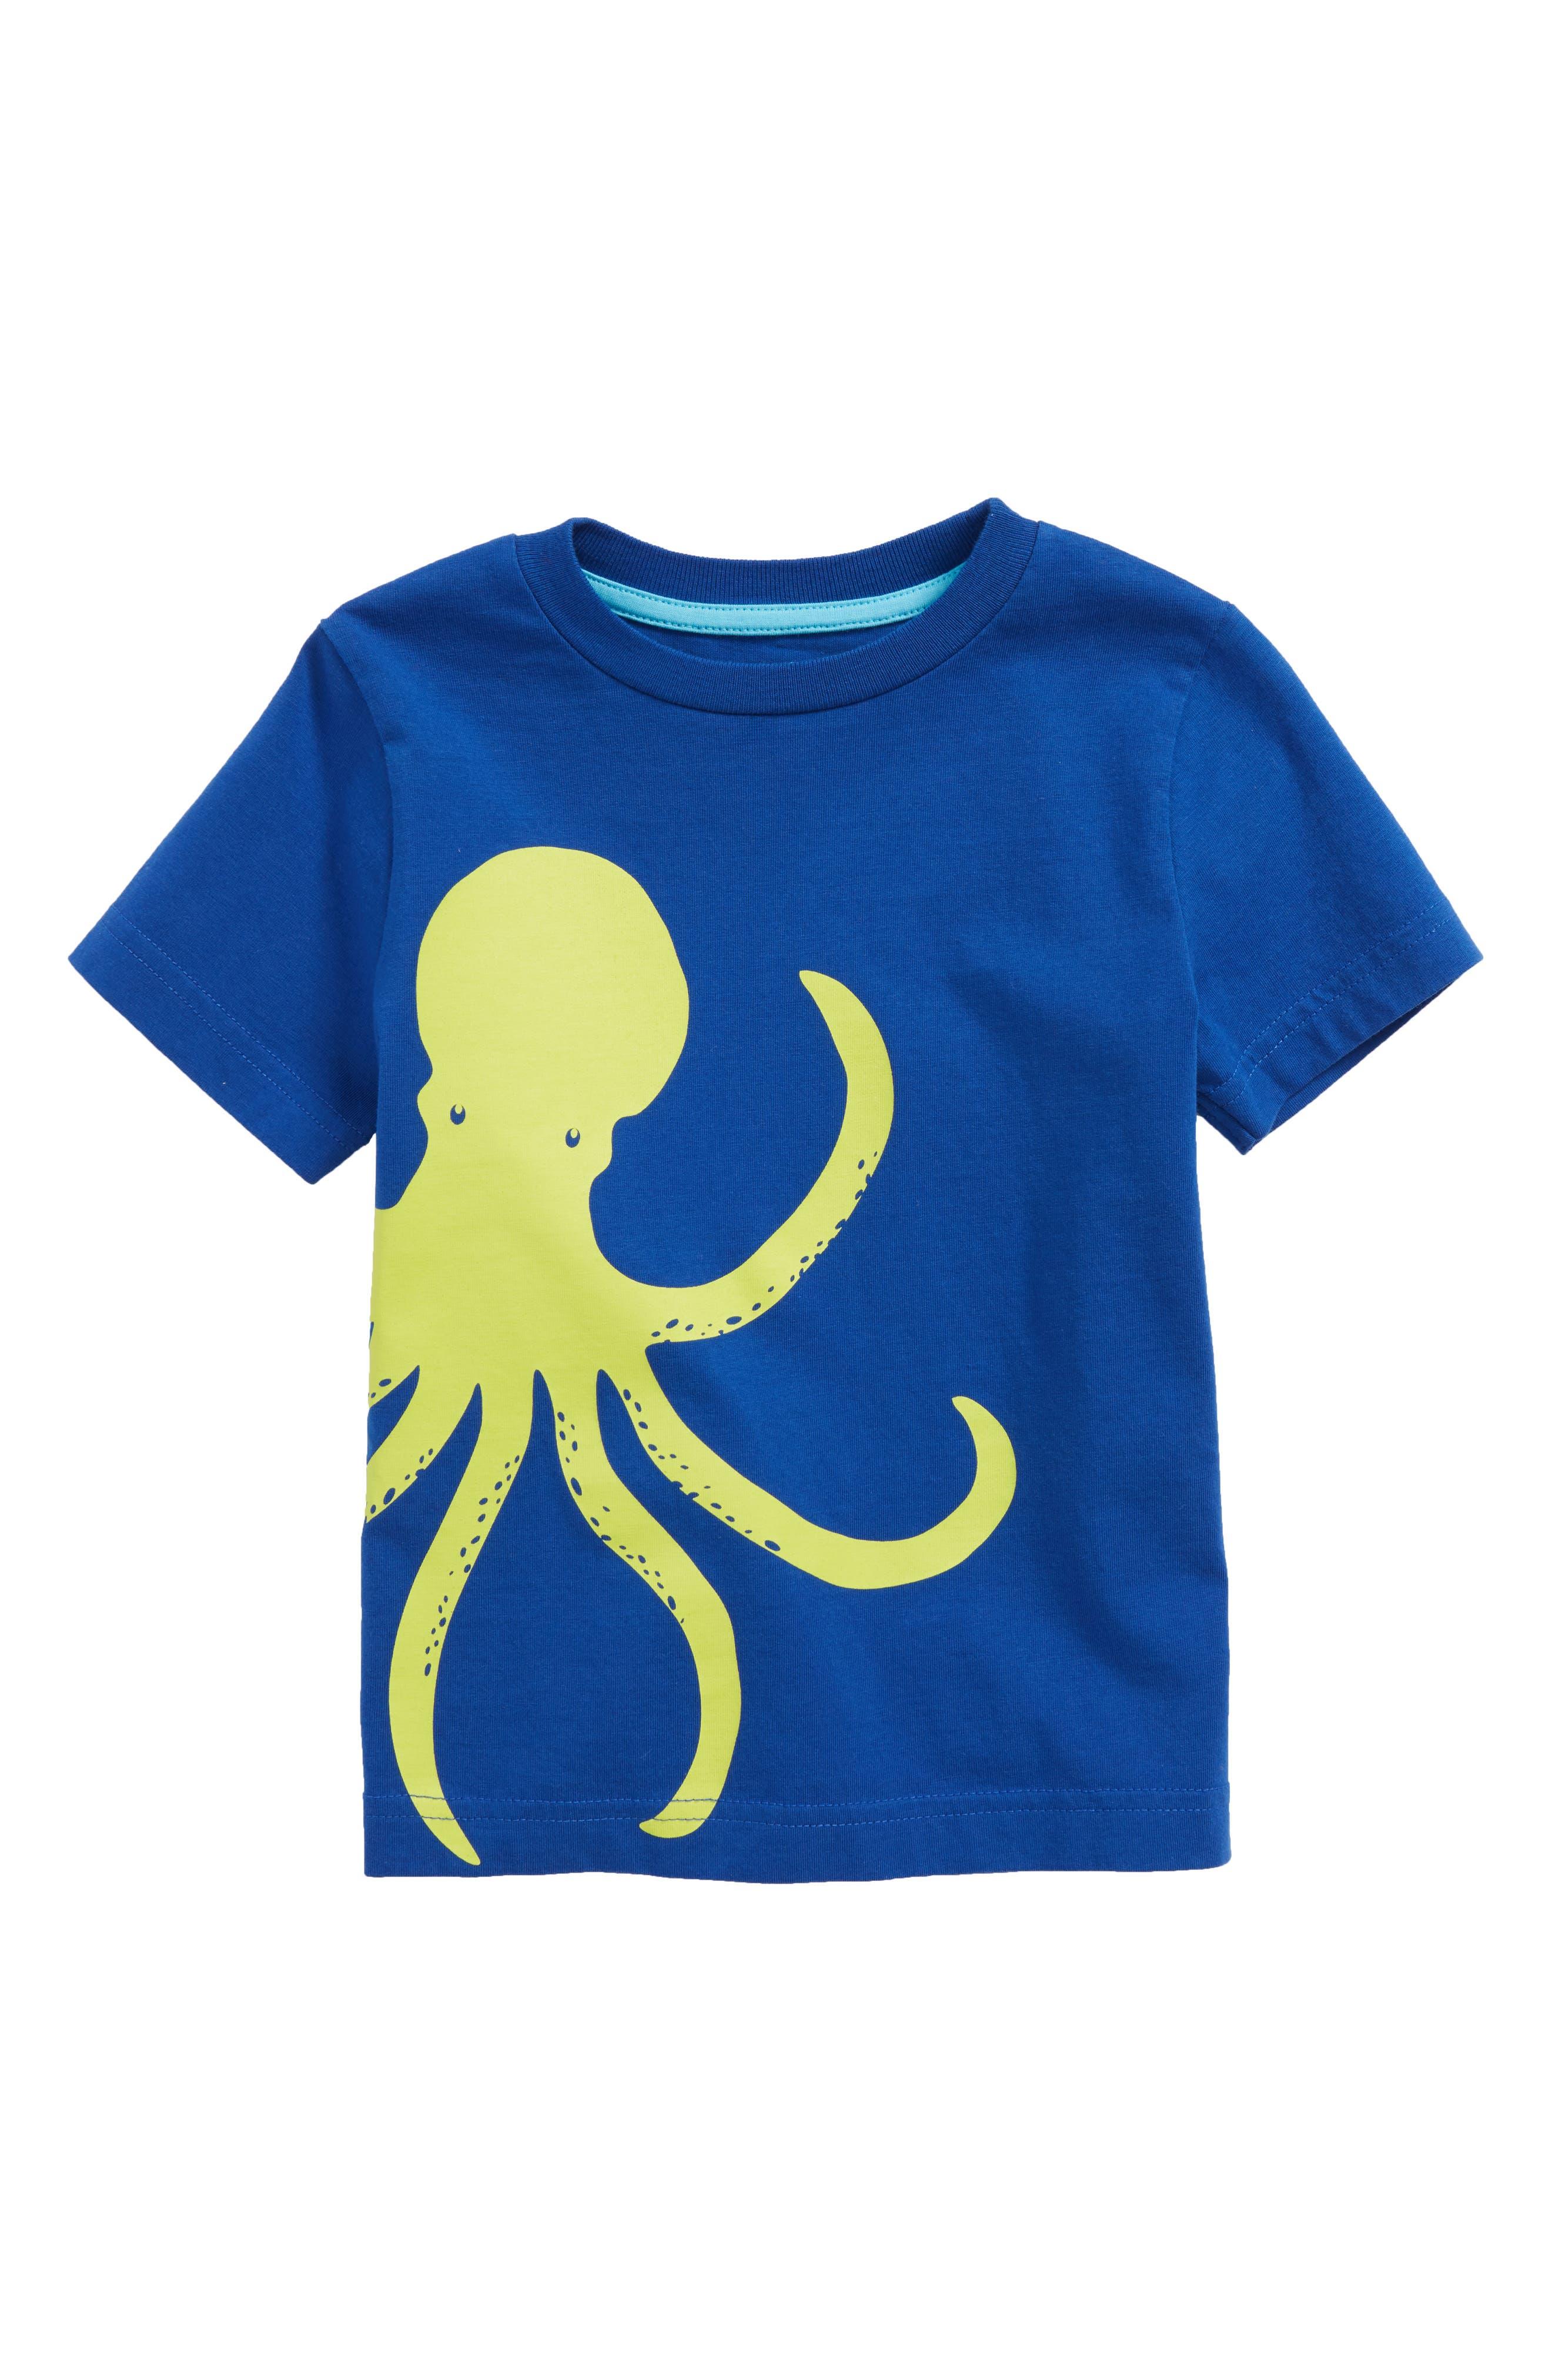 Wraparound Octopus T-Shirt,                         Main,                         color, Orion Blue Octopus